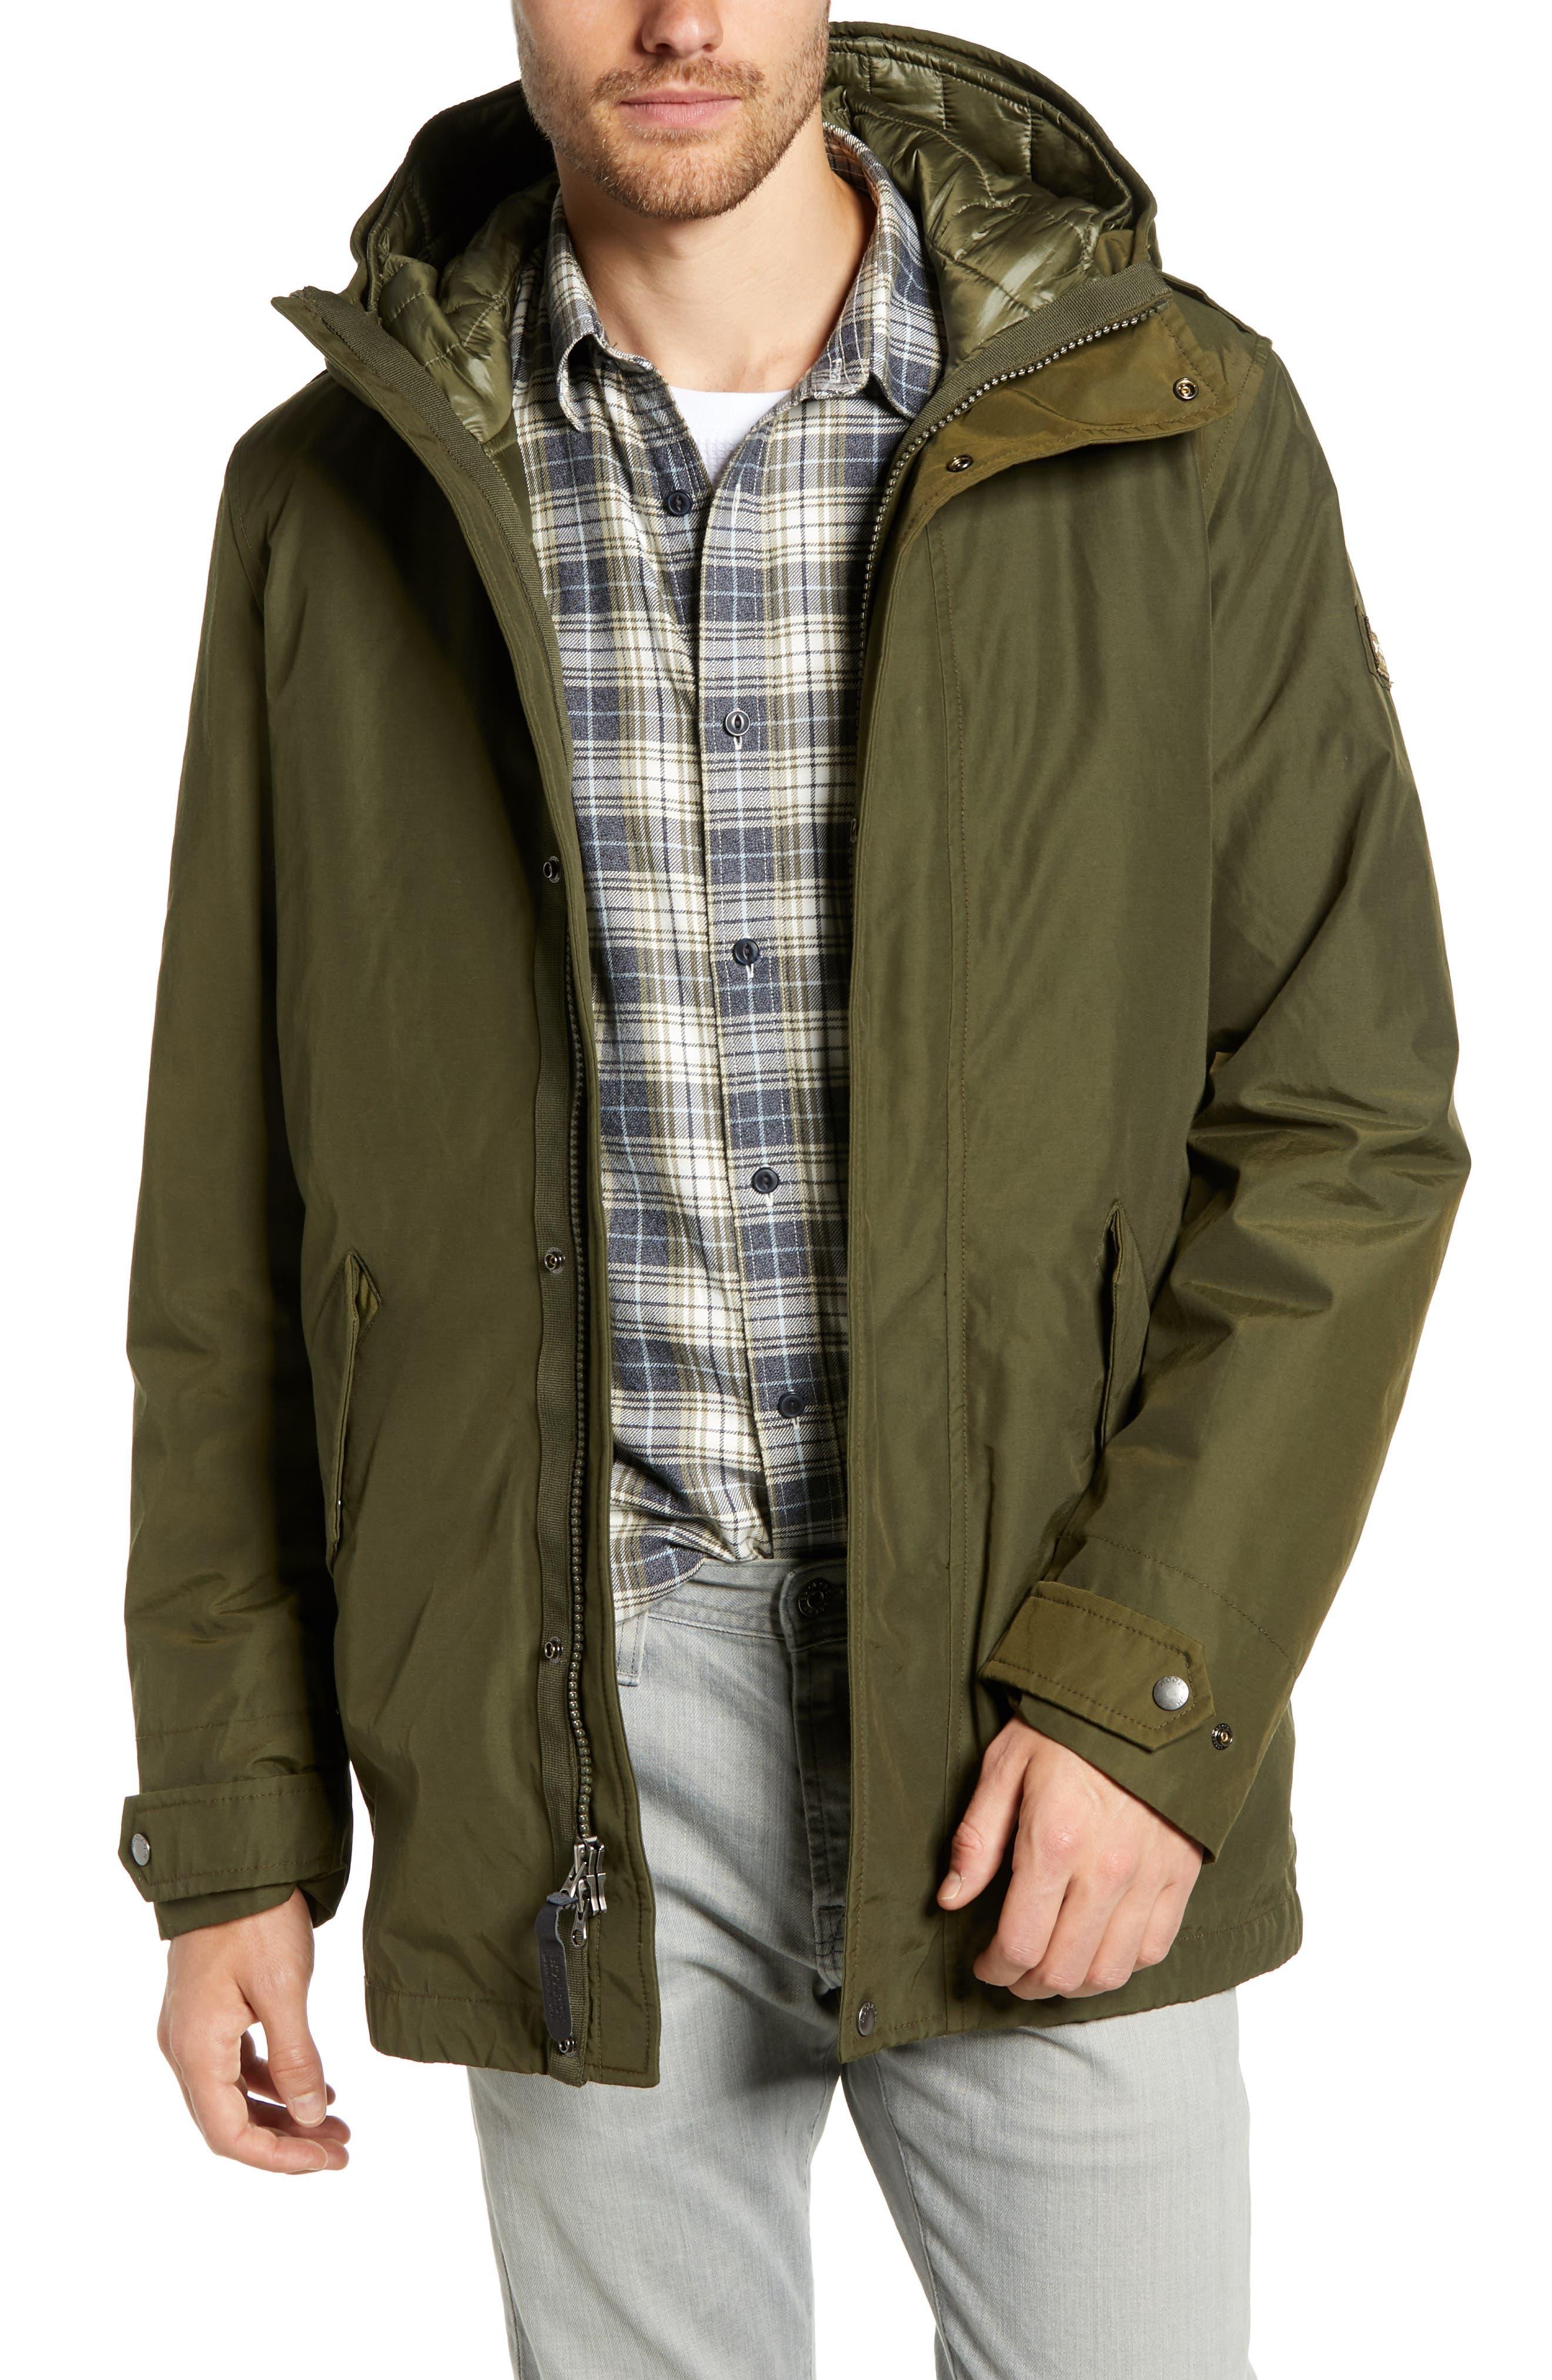 John Rich 'Long Military Eskimo' 3-in-1 Hooded Jacket,                         Main,                         color, FLINT OLIVE